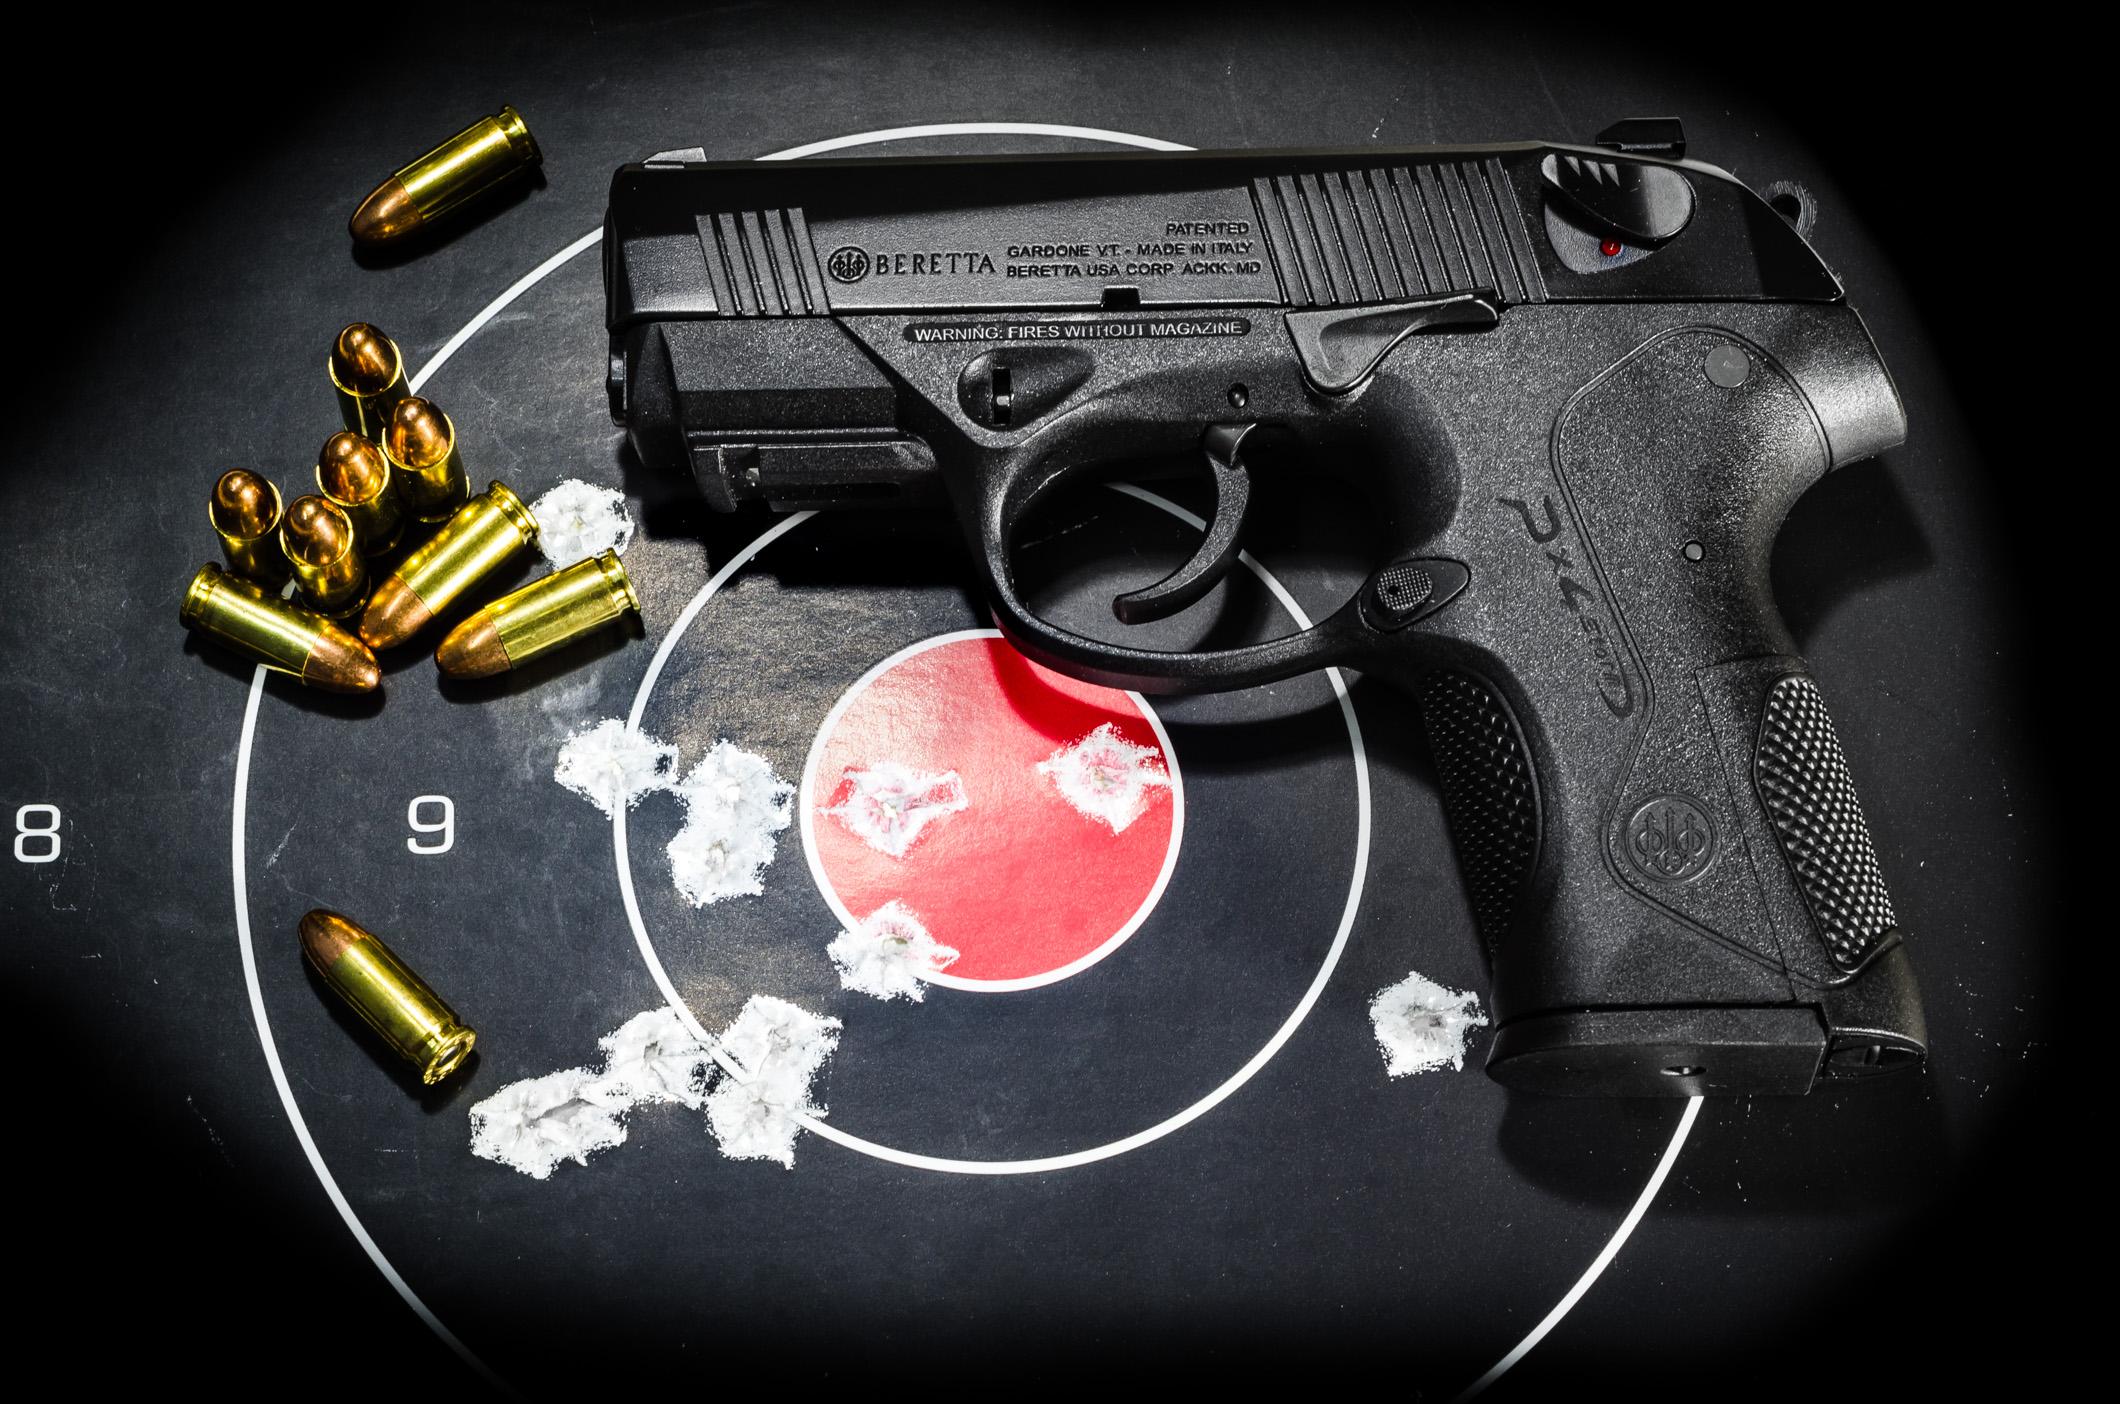 Beretta 9mm PX4 Storm Compact